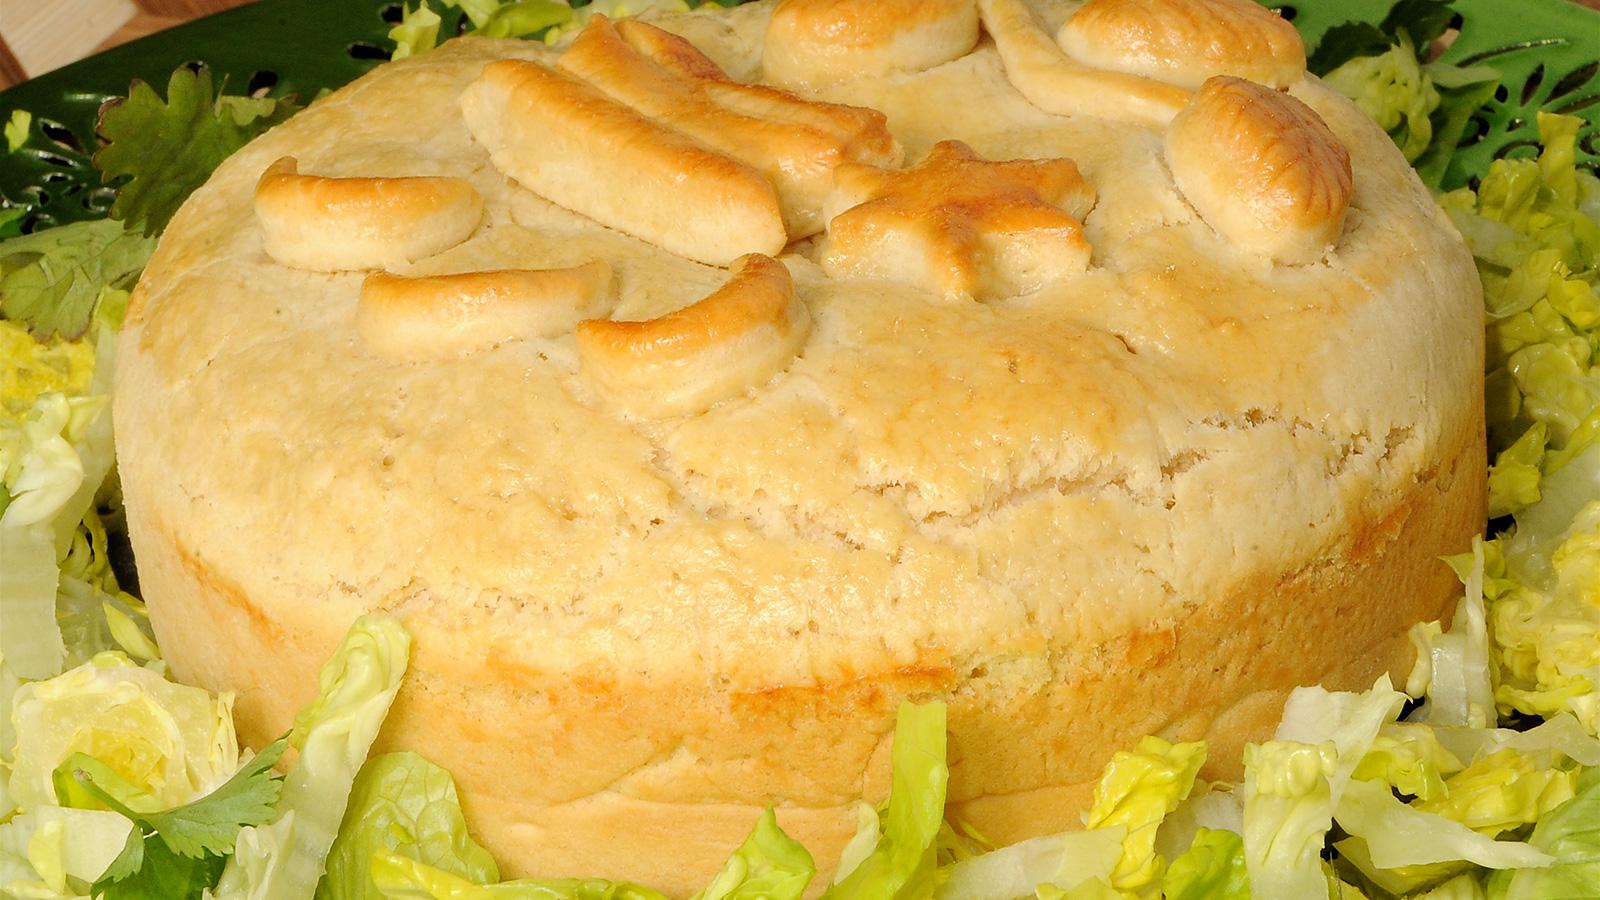 torta de pollo marta c225rdenas receta canal cocina